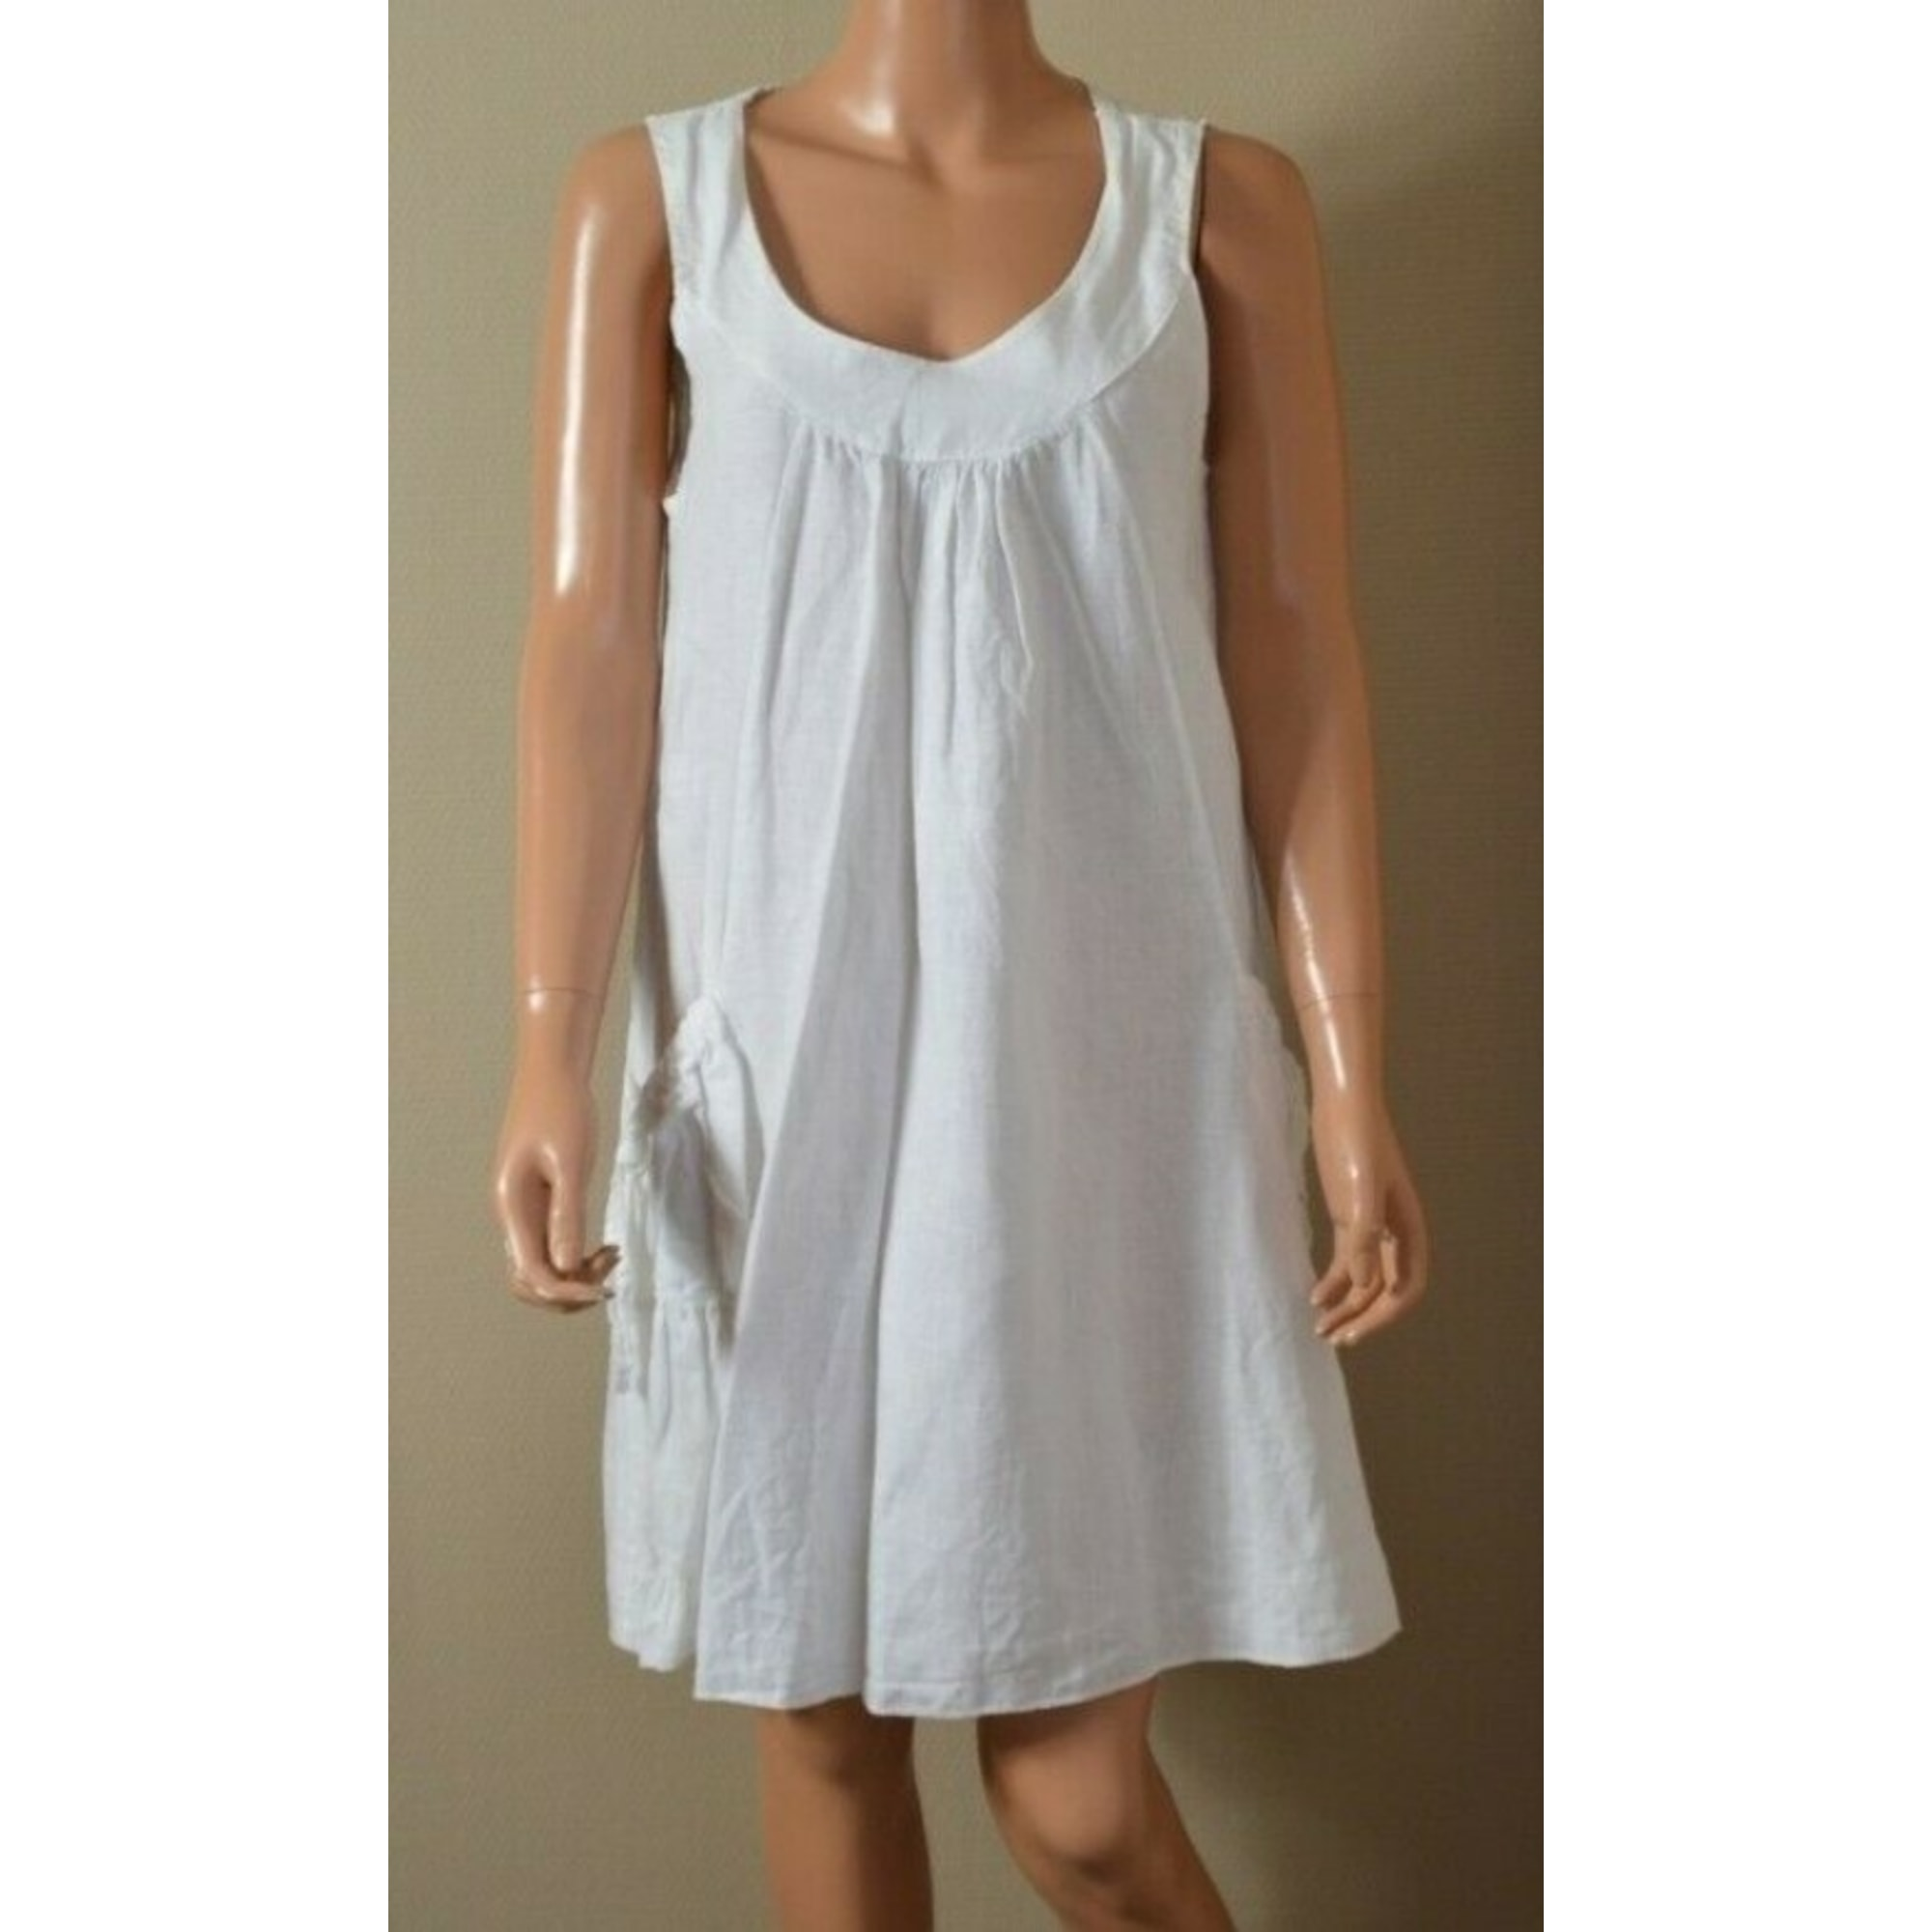 Robe mi-longue MADE IN ITALIE Blanc, blanc cassé, écru